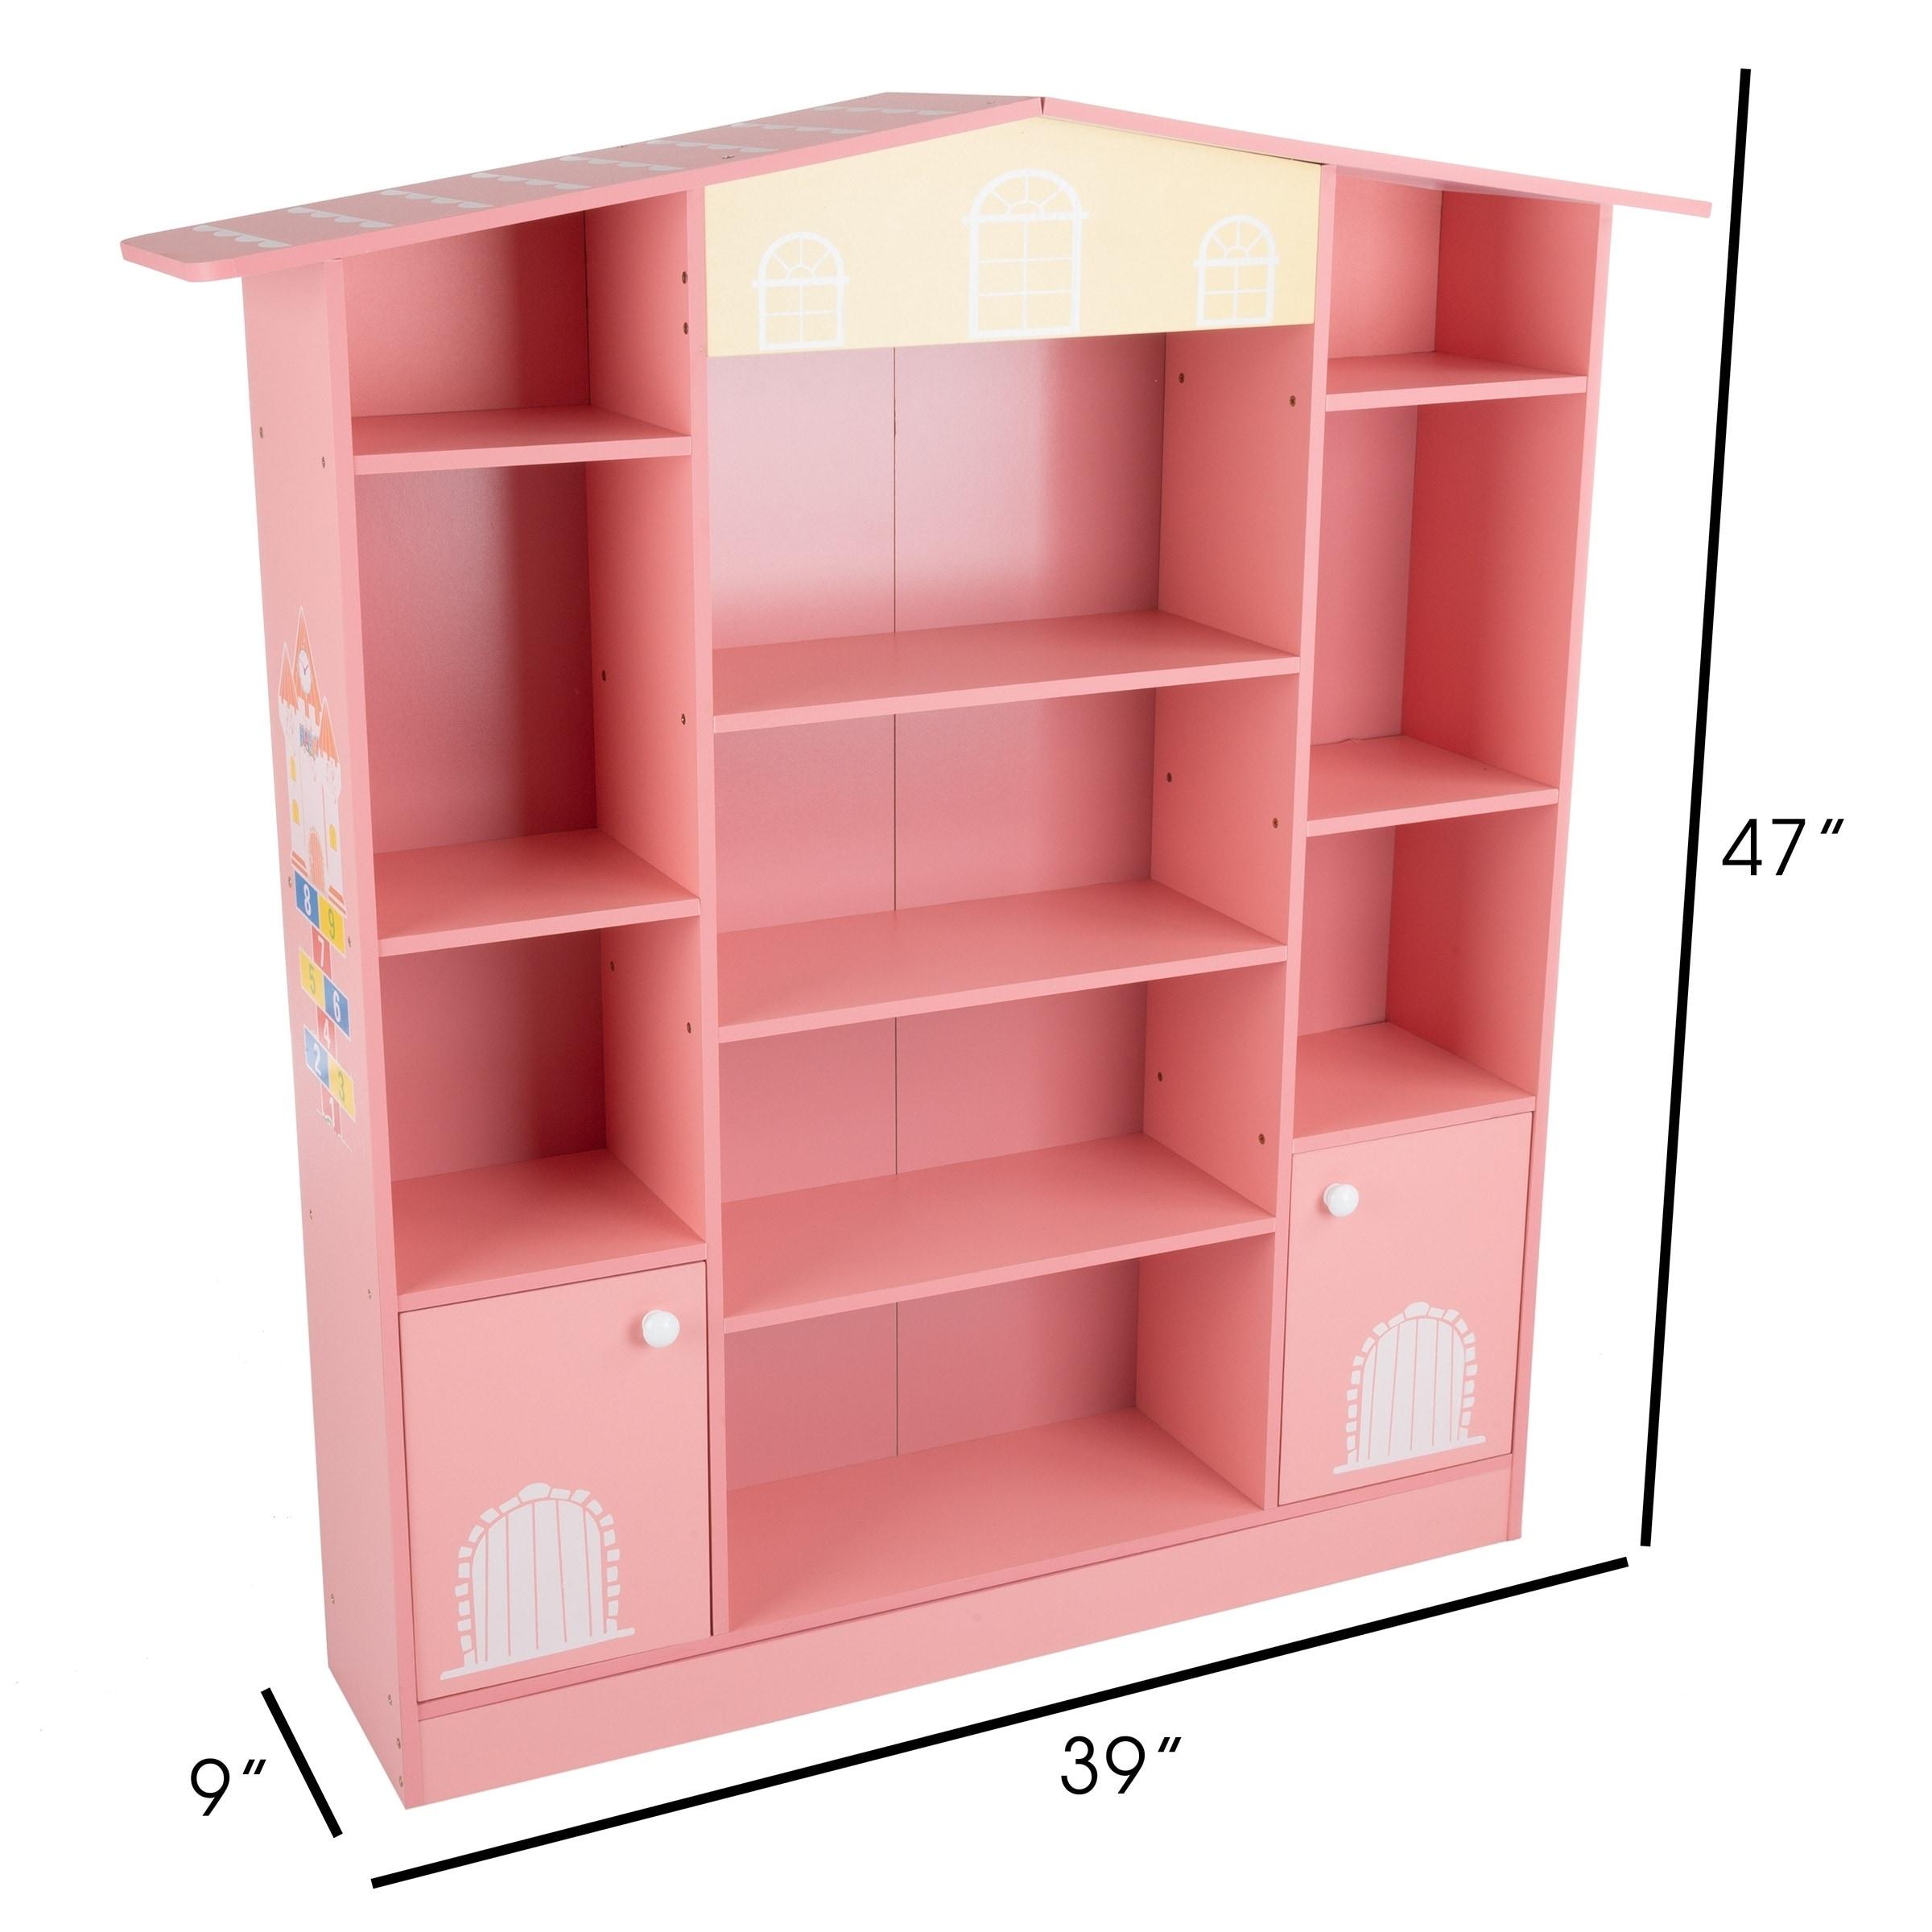 Shop Dollhouse Shaped Bookcase Cottage Design Furniture For Books